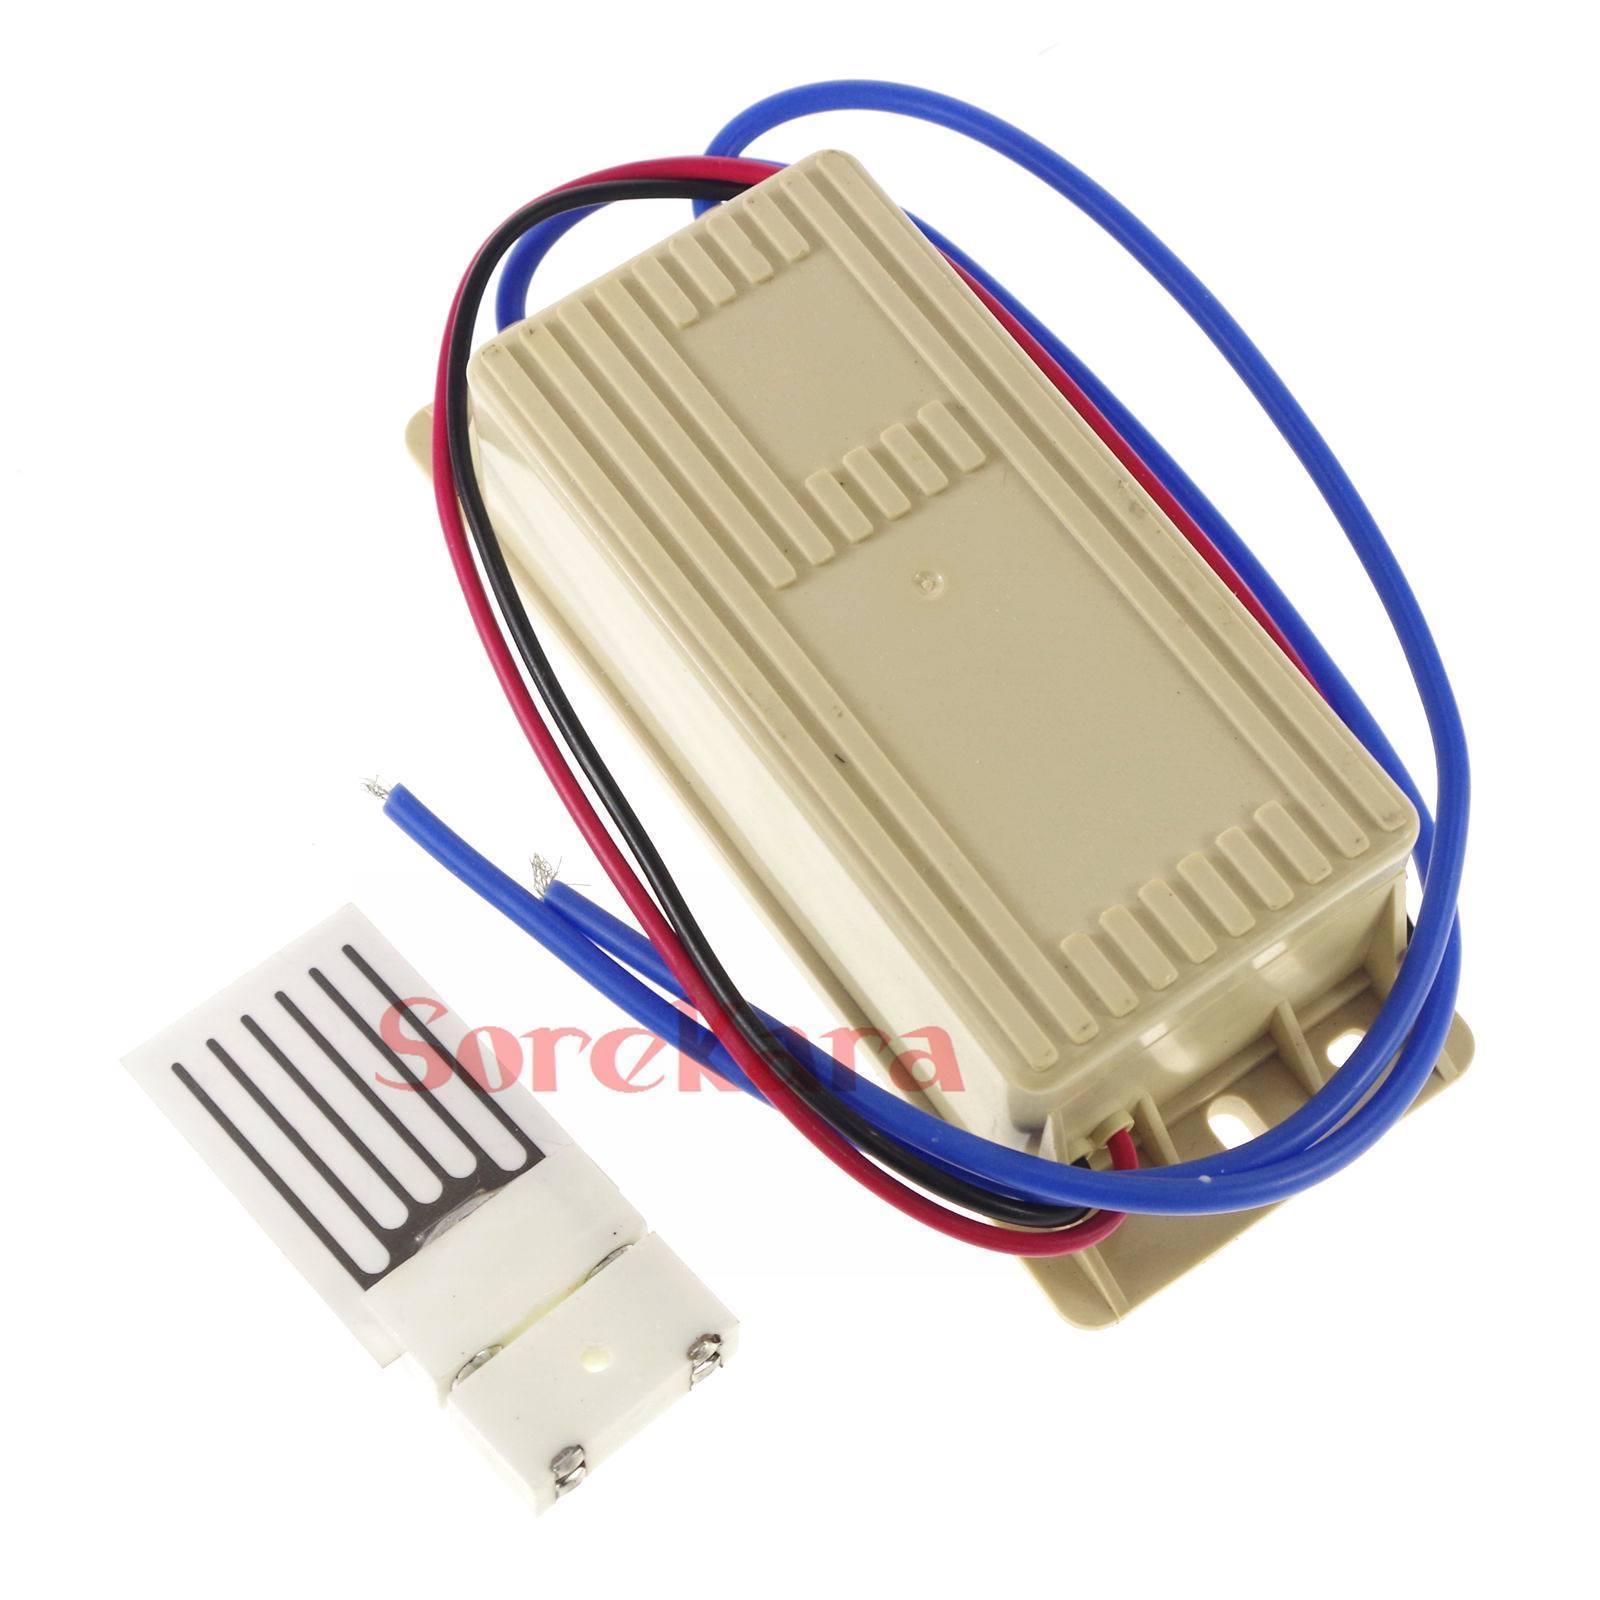 Kit Output 1g/h 2g/h 12VDC 110VAC 220VAC Power Supply +Ceramic Plate Circuit Board Ozone Generator Air Purifier 3-3.5KV 16KHZ